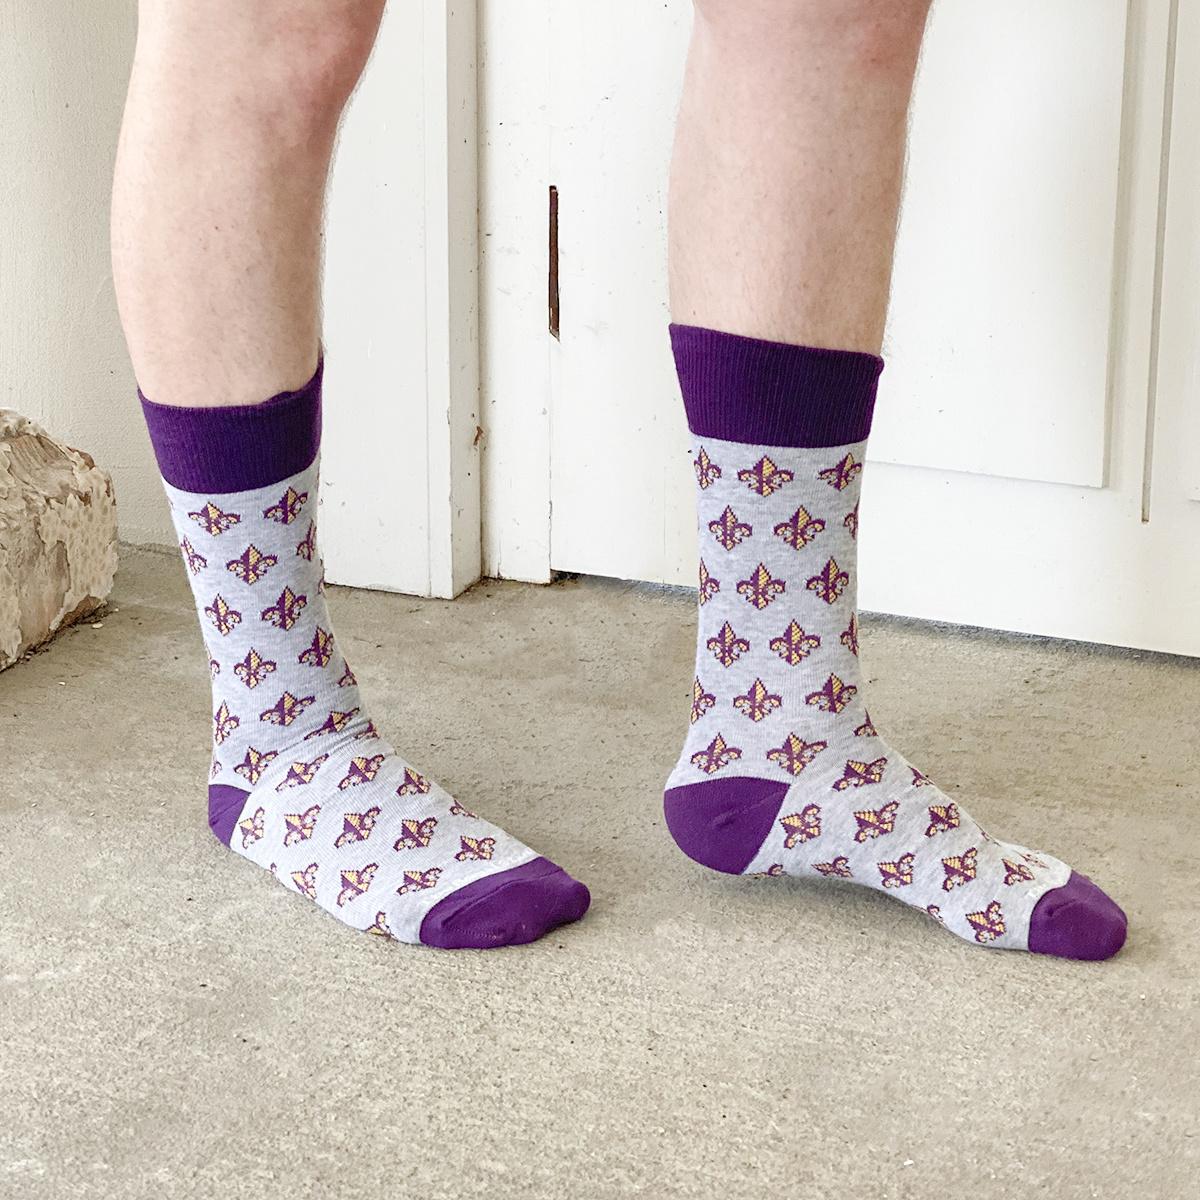 FDL Socks GREY/PURPLE/YELLOW